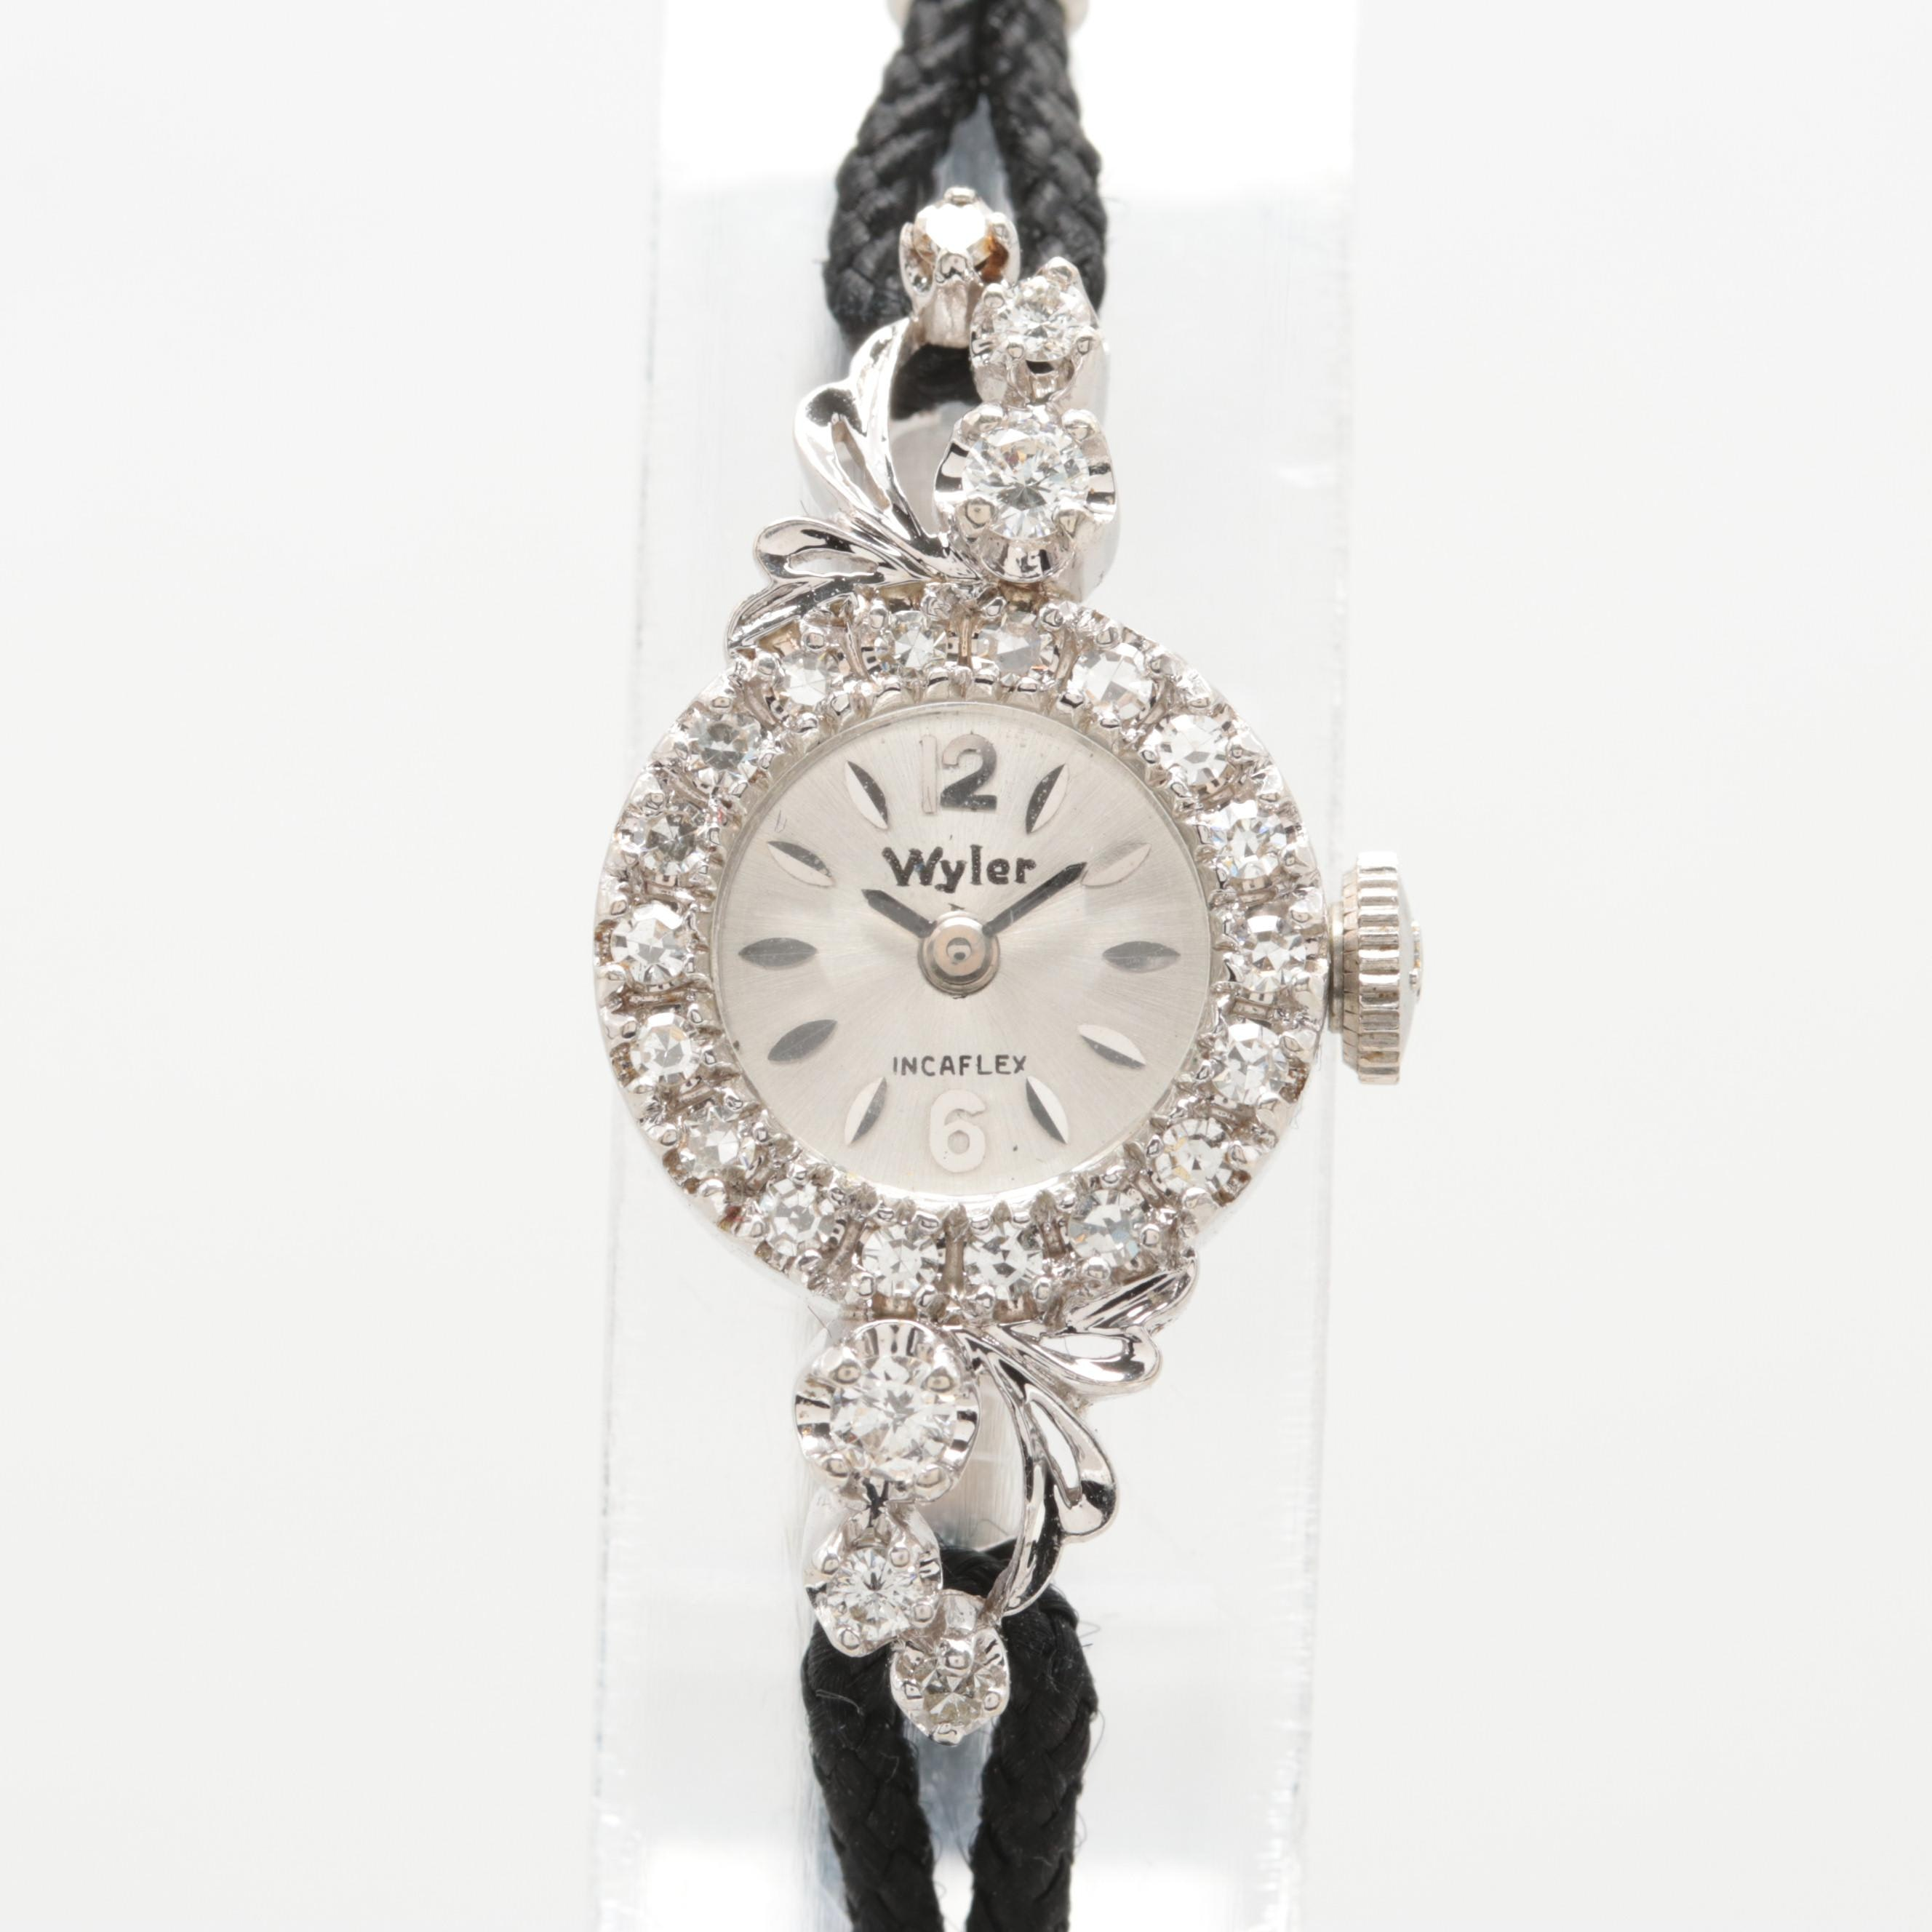 Vintage Wyler 14K White Gold Diamond Stem Wind Wristwatch